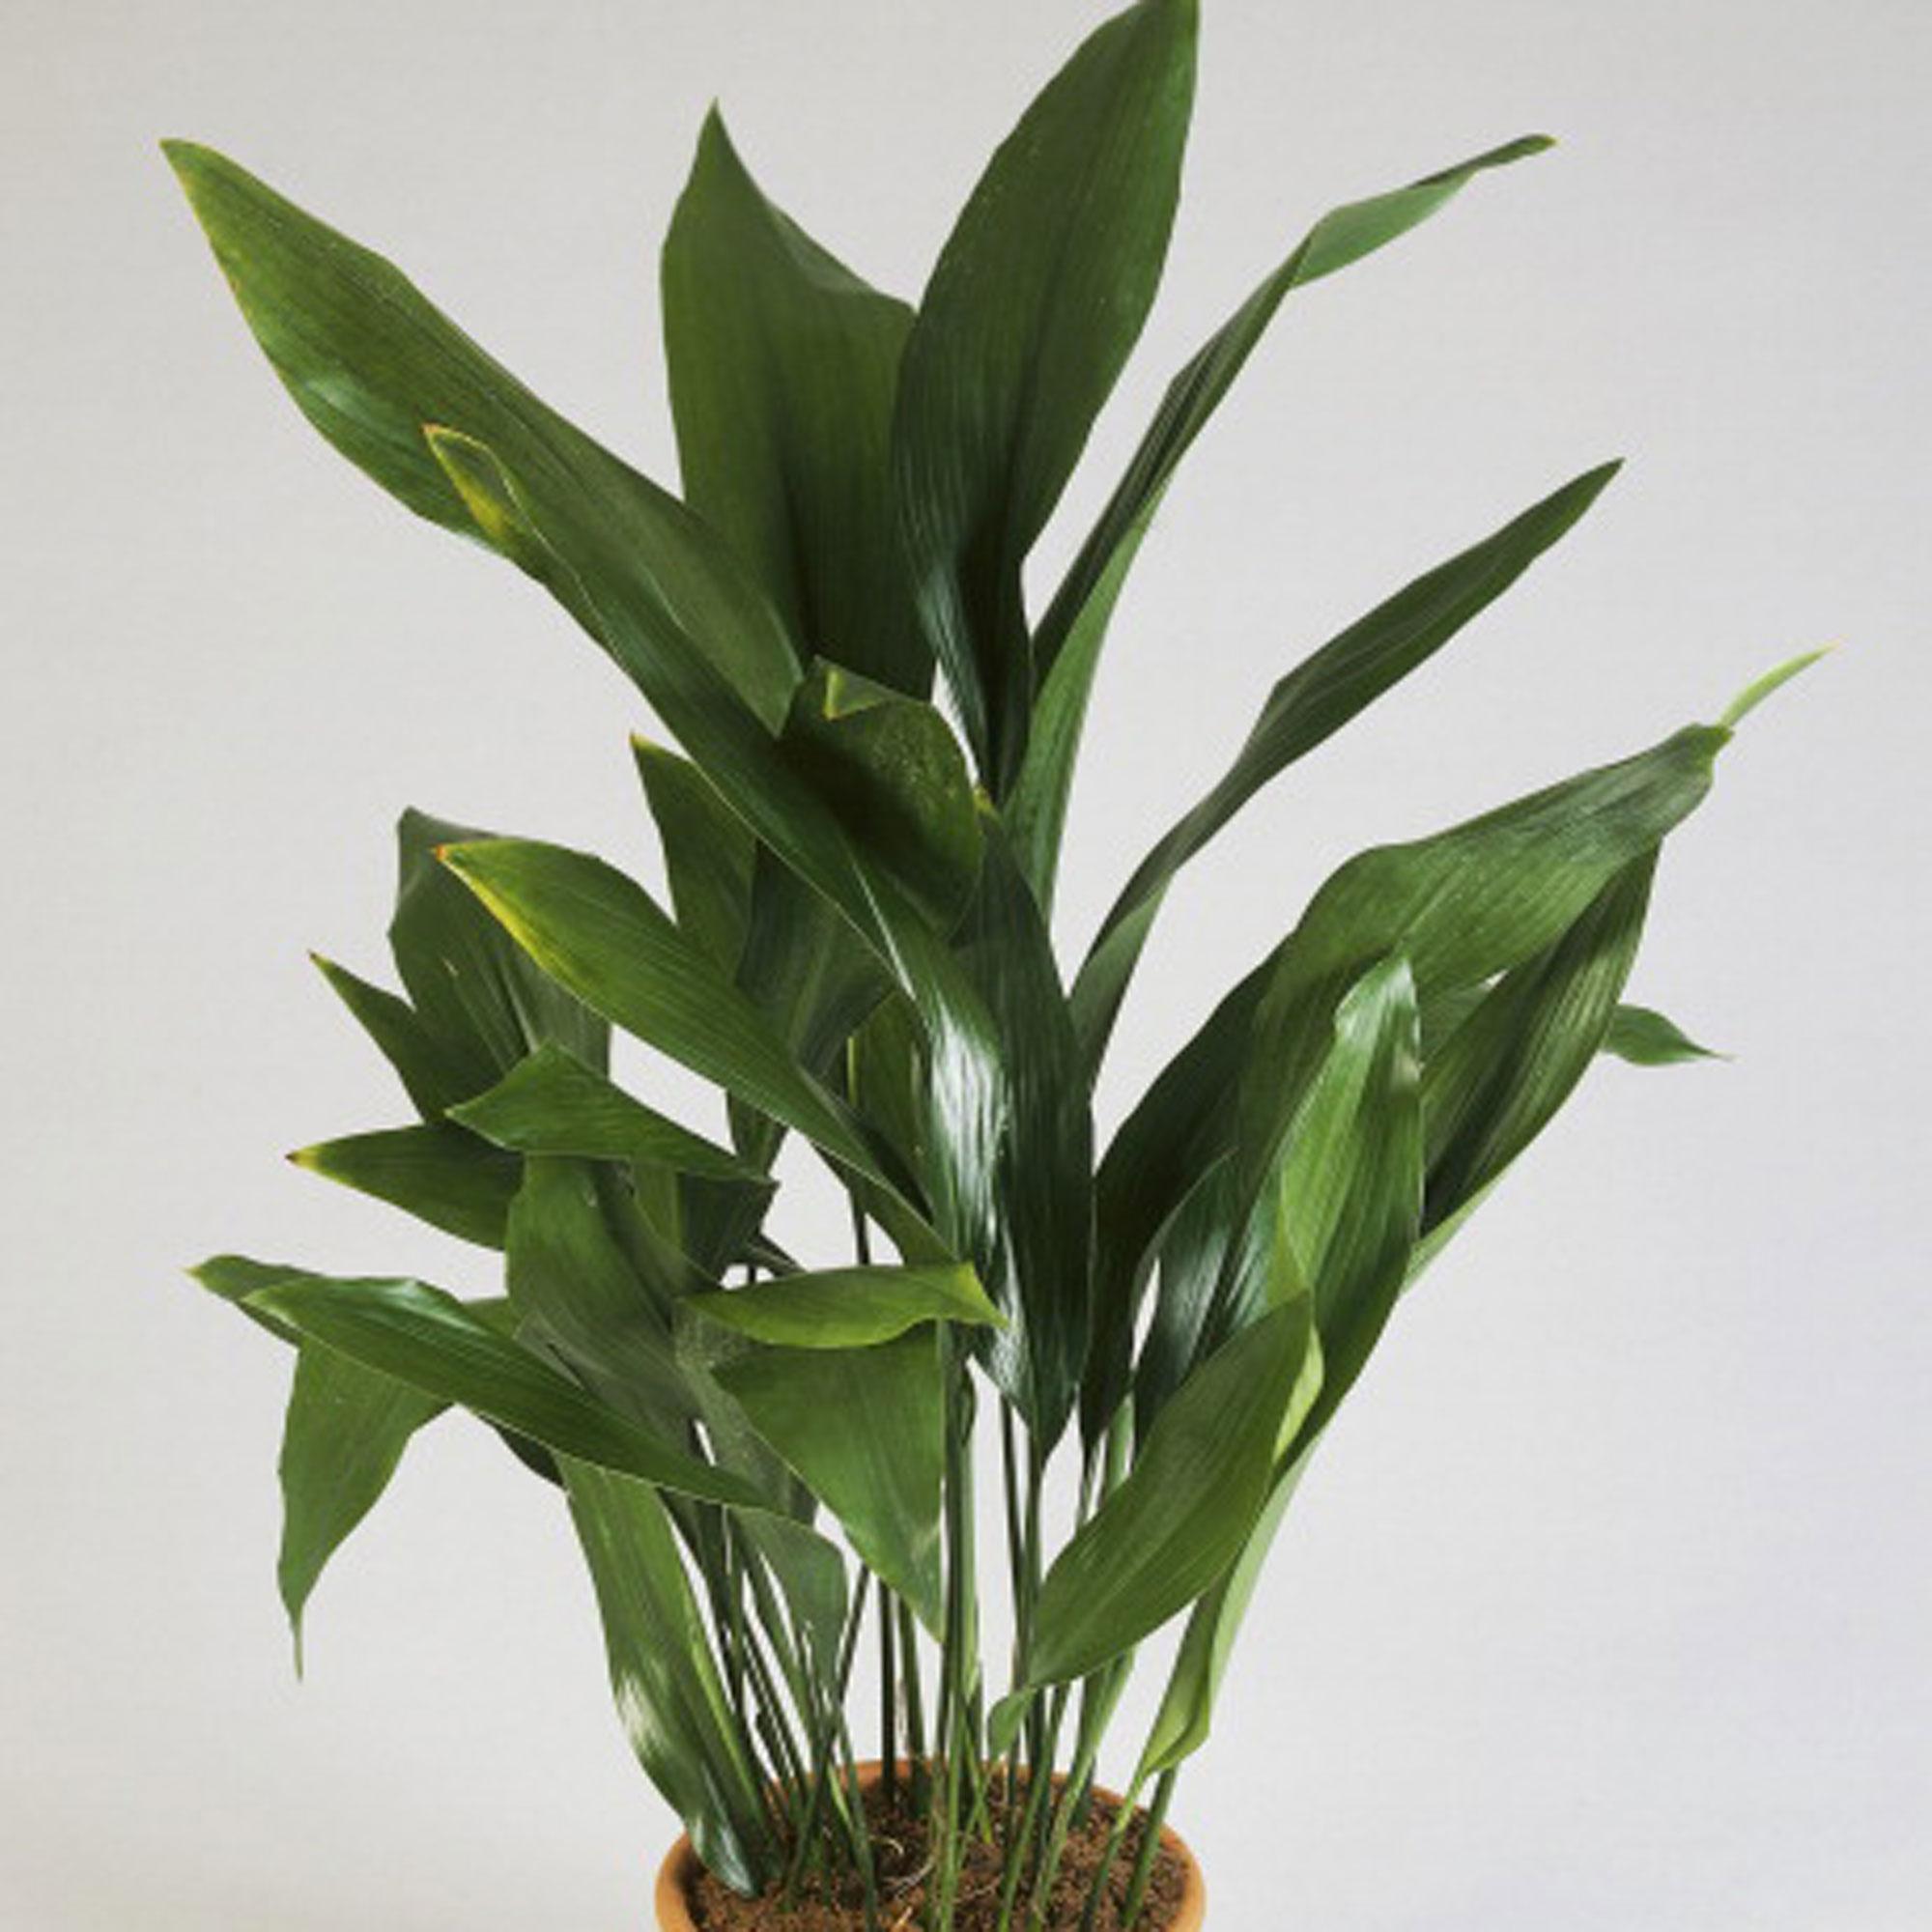 House Plant Grow Light: 10 Best Houseplants For Low Light